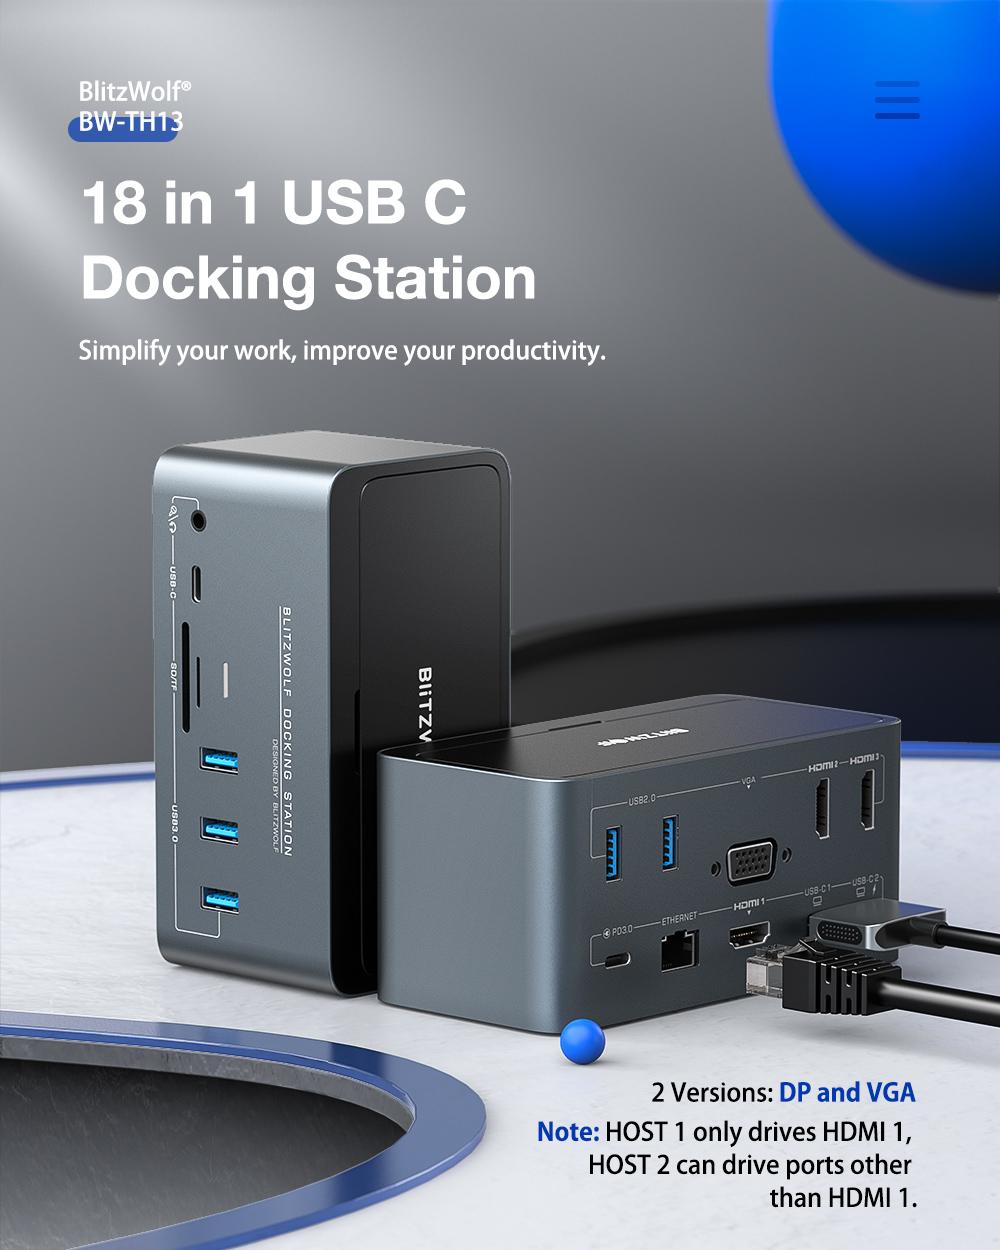 Blitzwolf BW-TH13 docking station, USB HUB